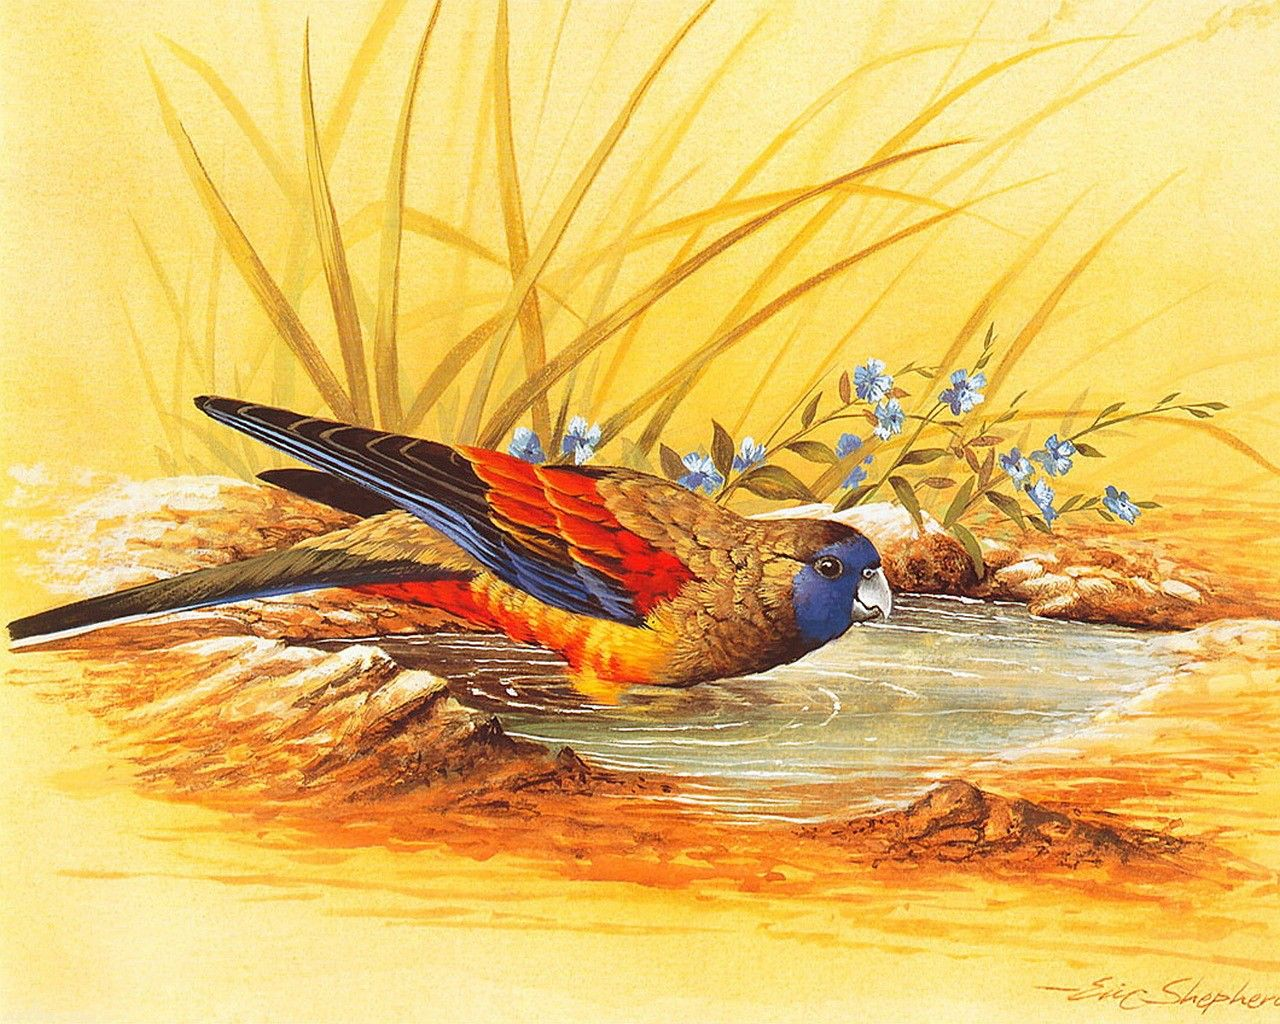 картинки иллюстрации птиц раньше